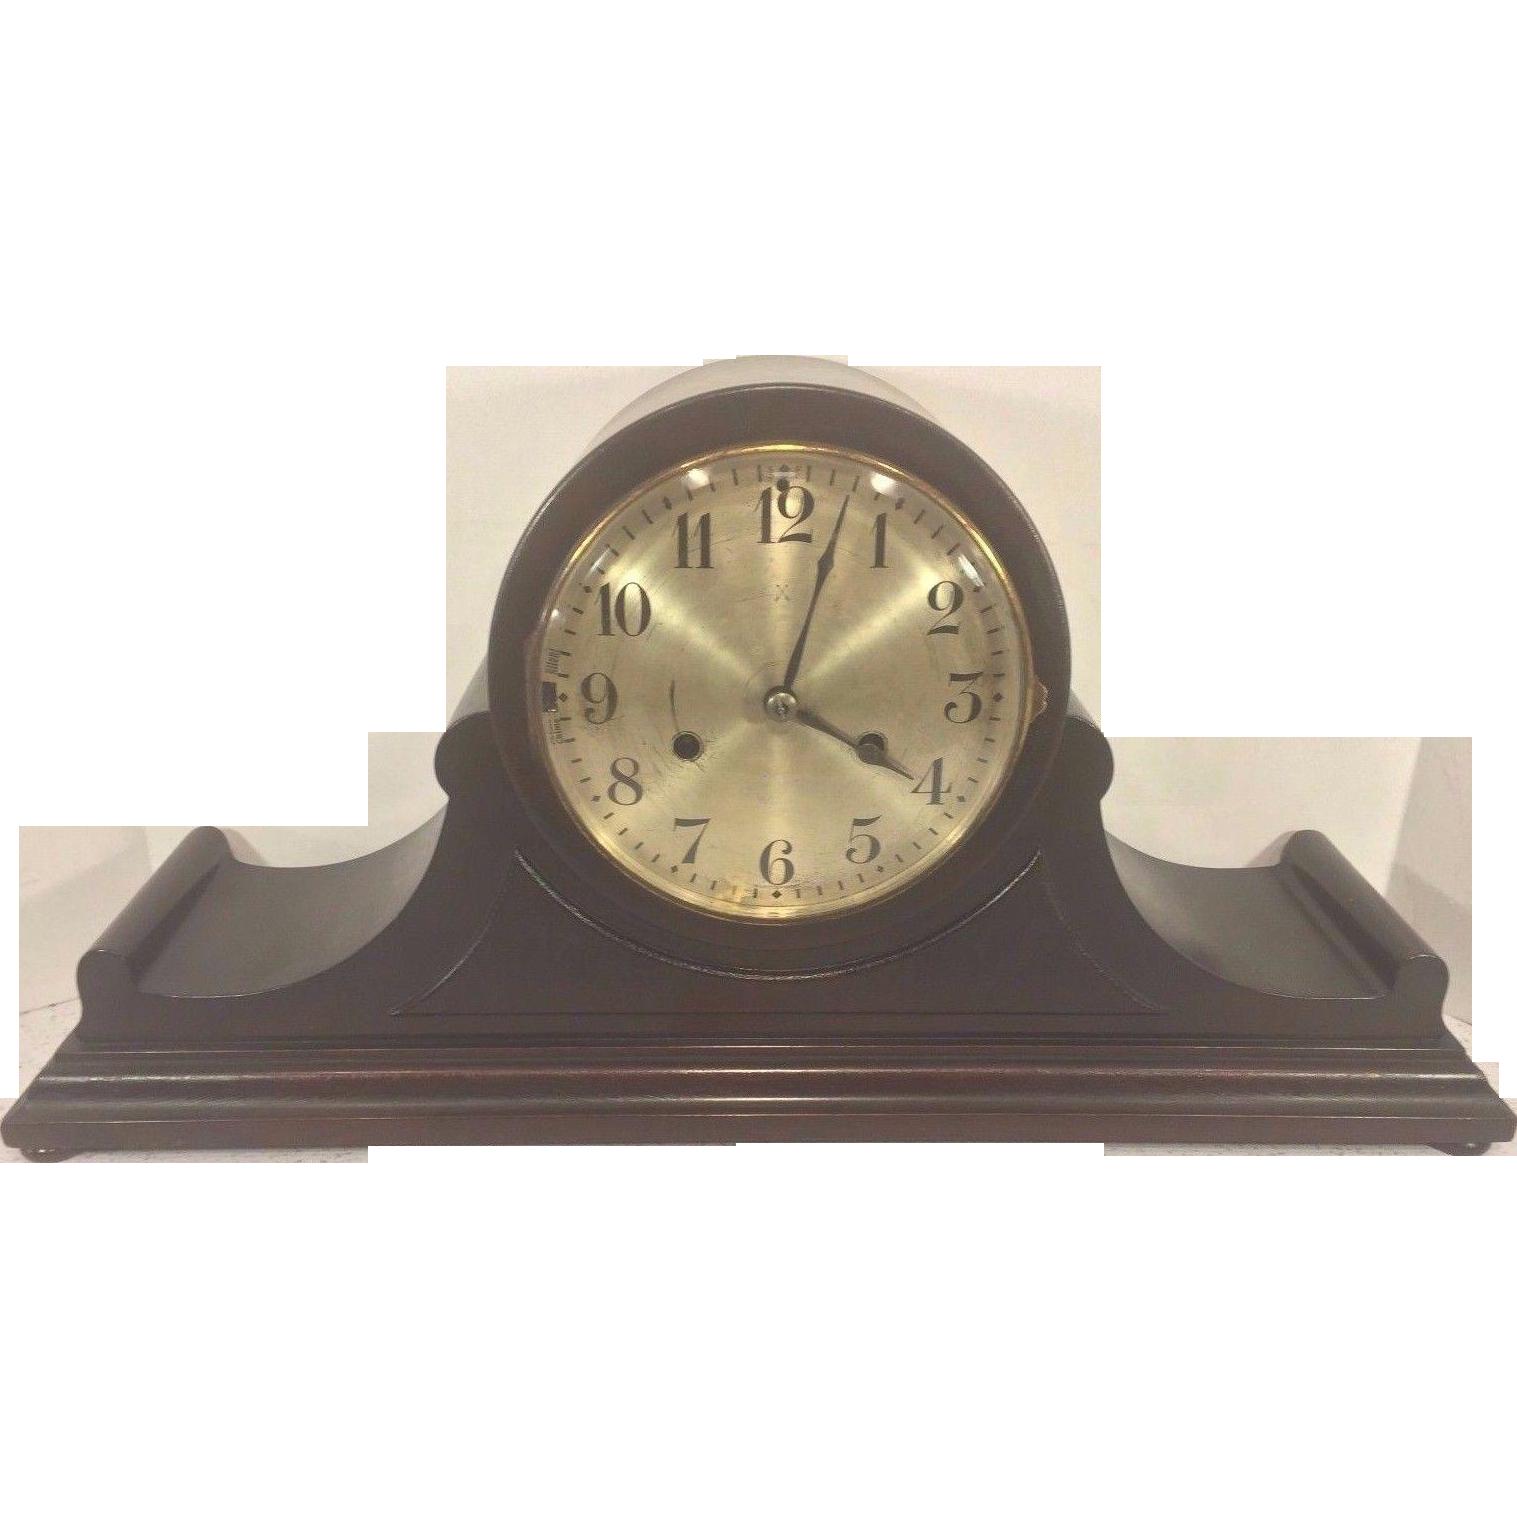 Vintage hamburg american clock co hac tambour case clock running vintage hamburg american clock co hac tambour case clock running westminster chimes amipublicfo Choice Image